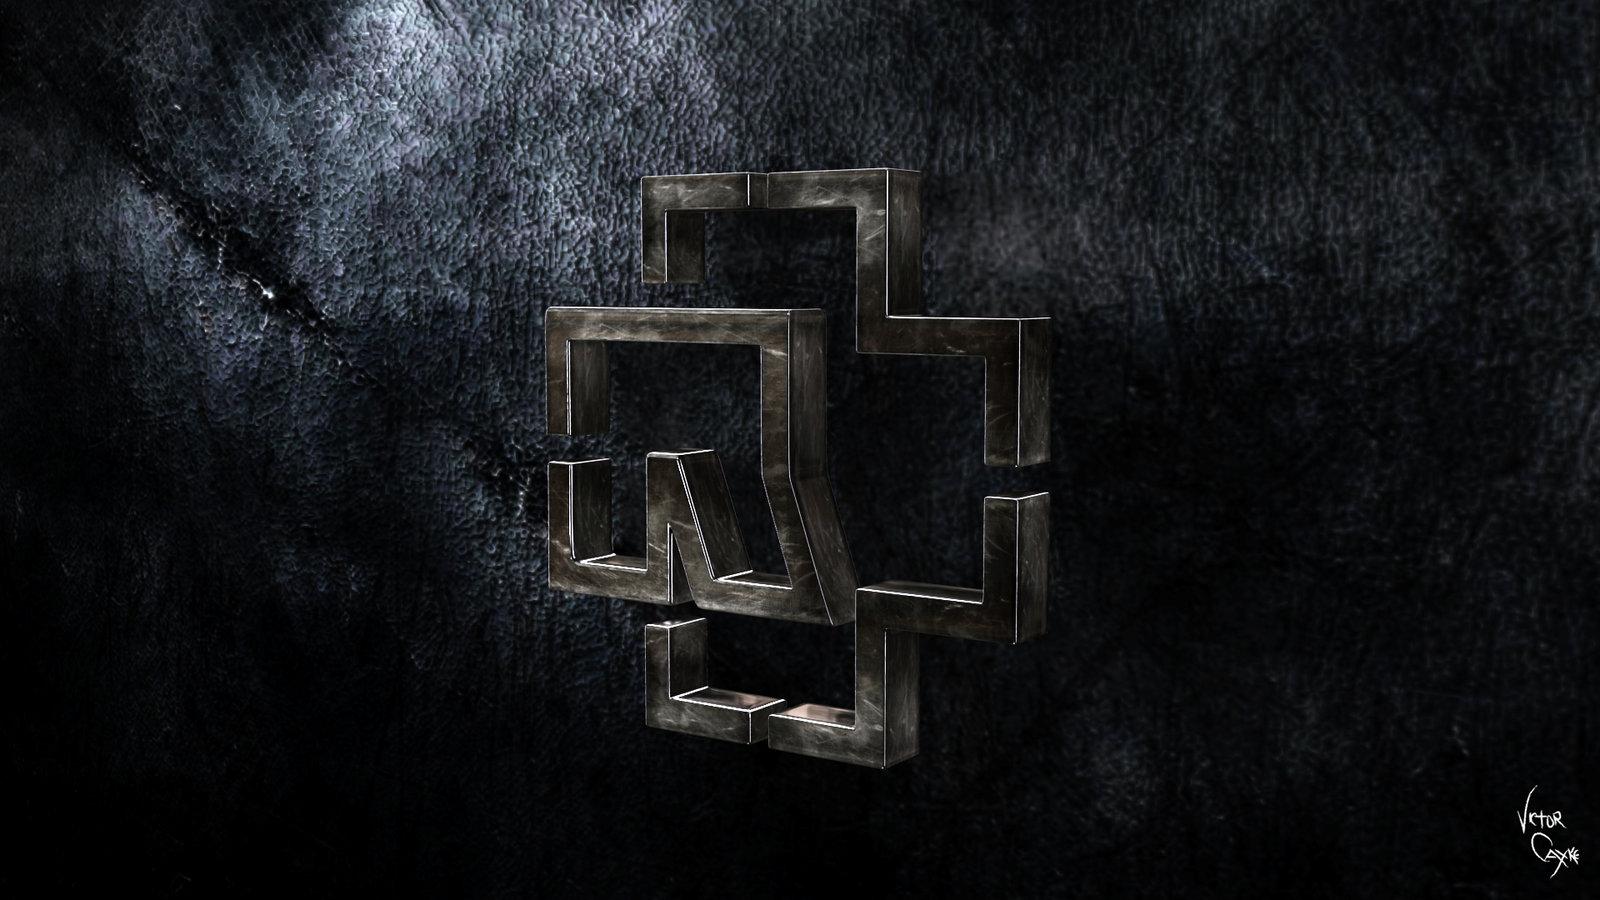 Rammstein hd wallpaper download